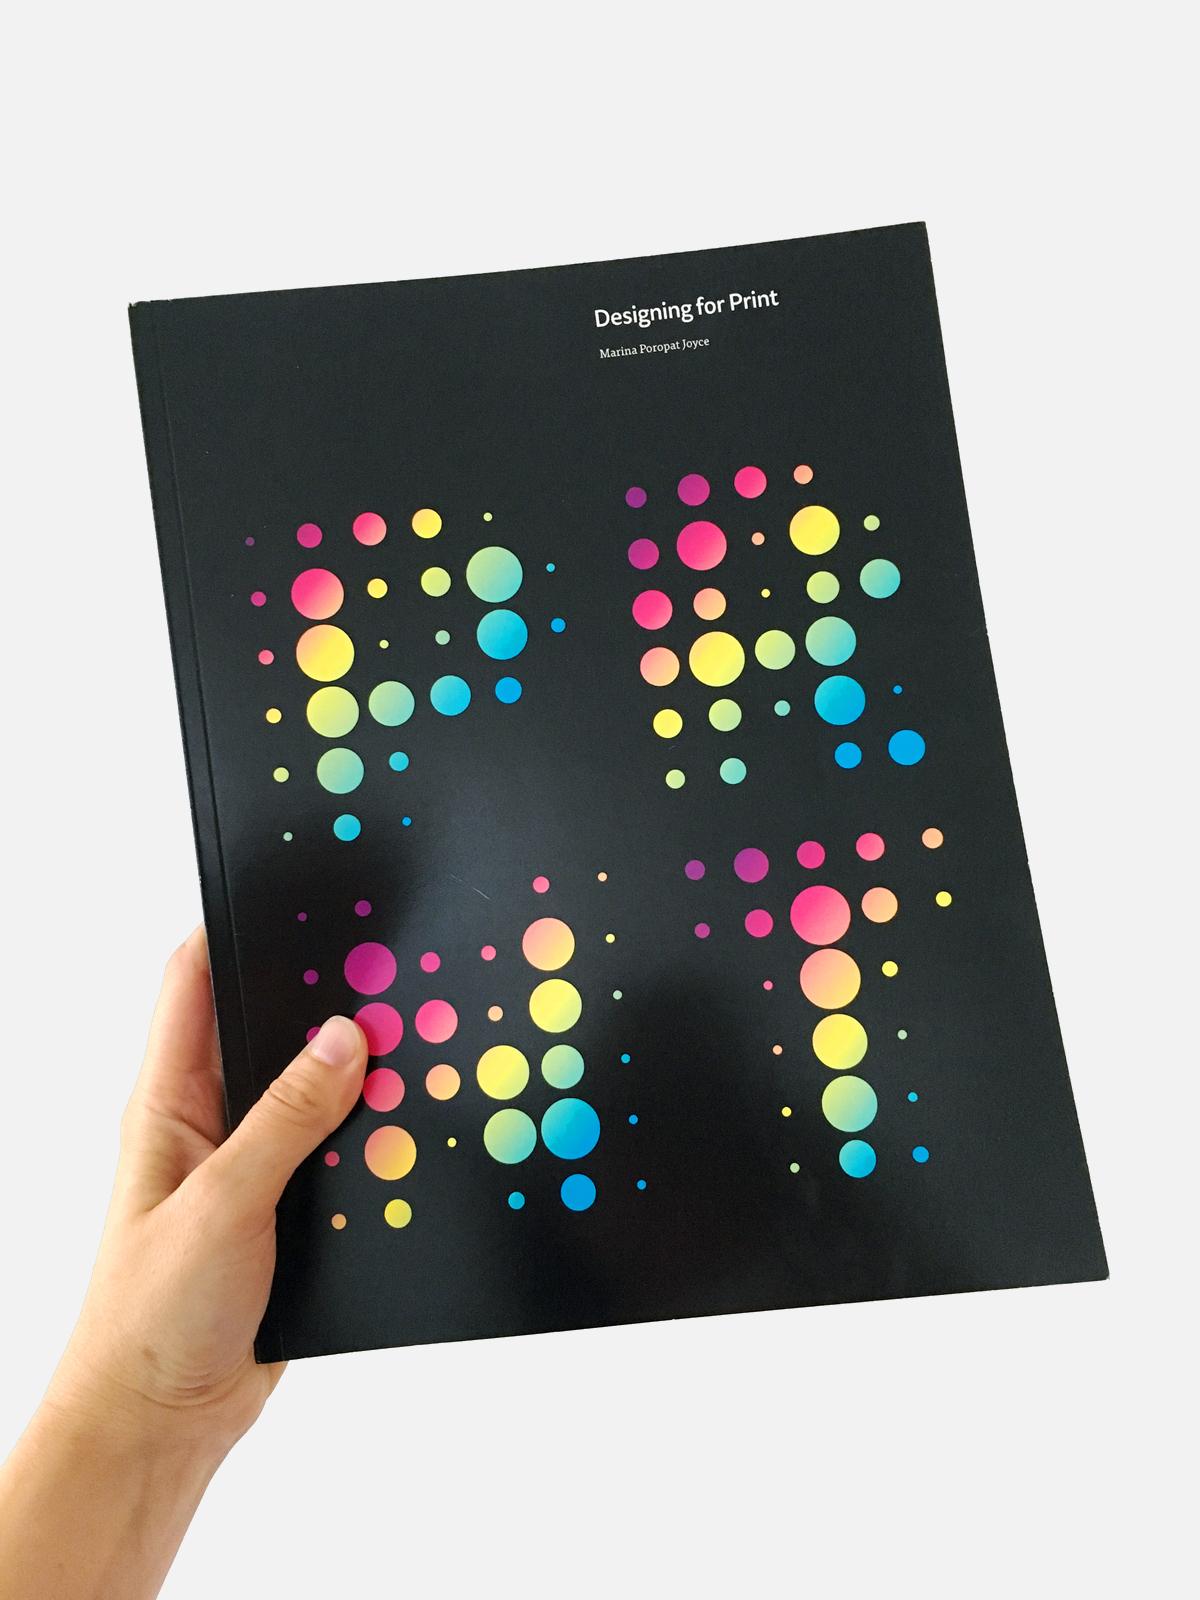 designingforprint-lowres.jpg